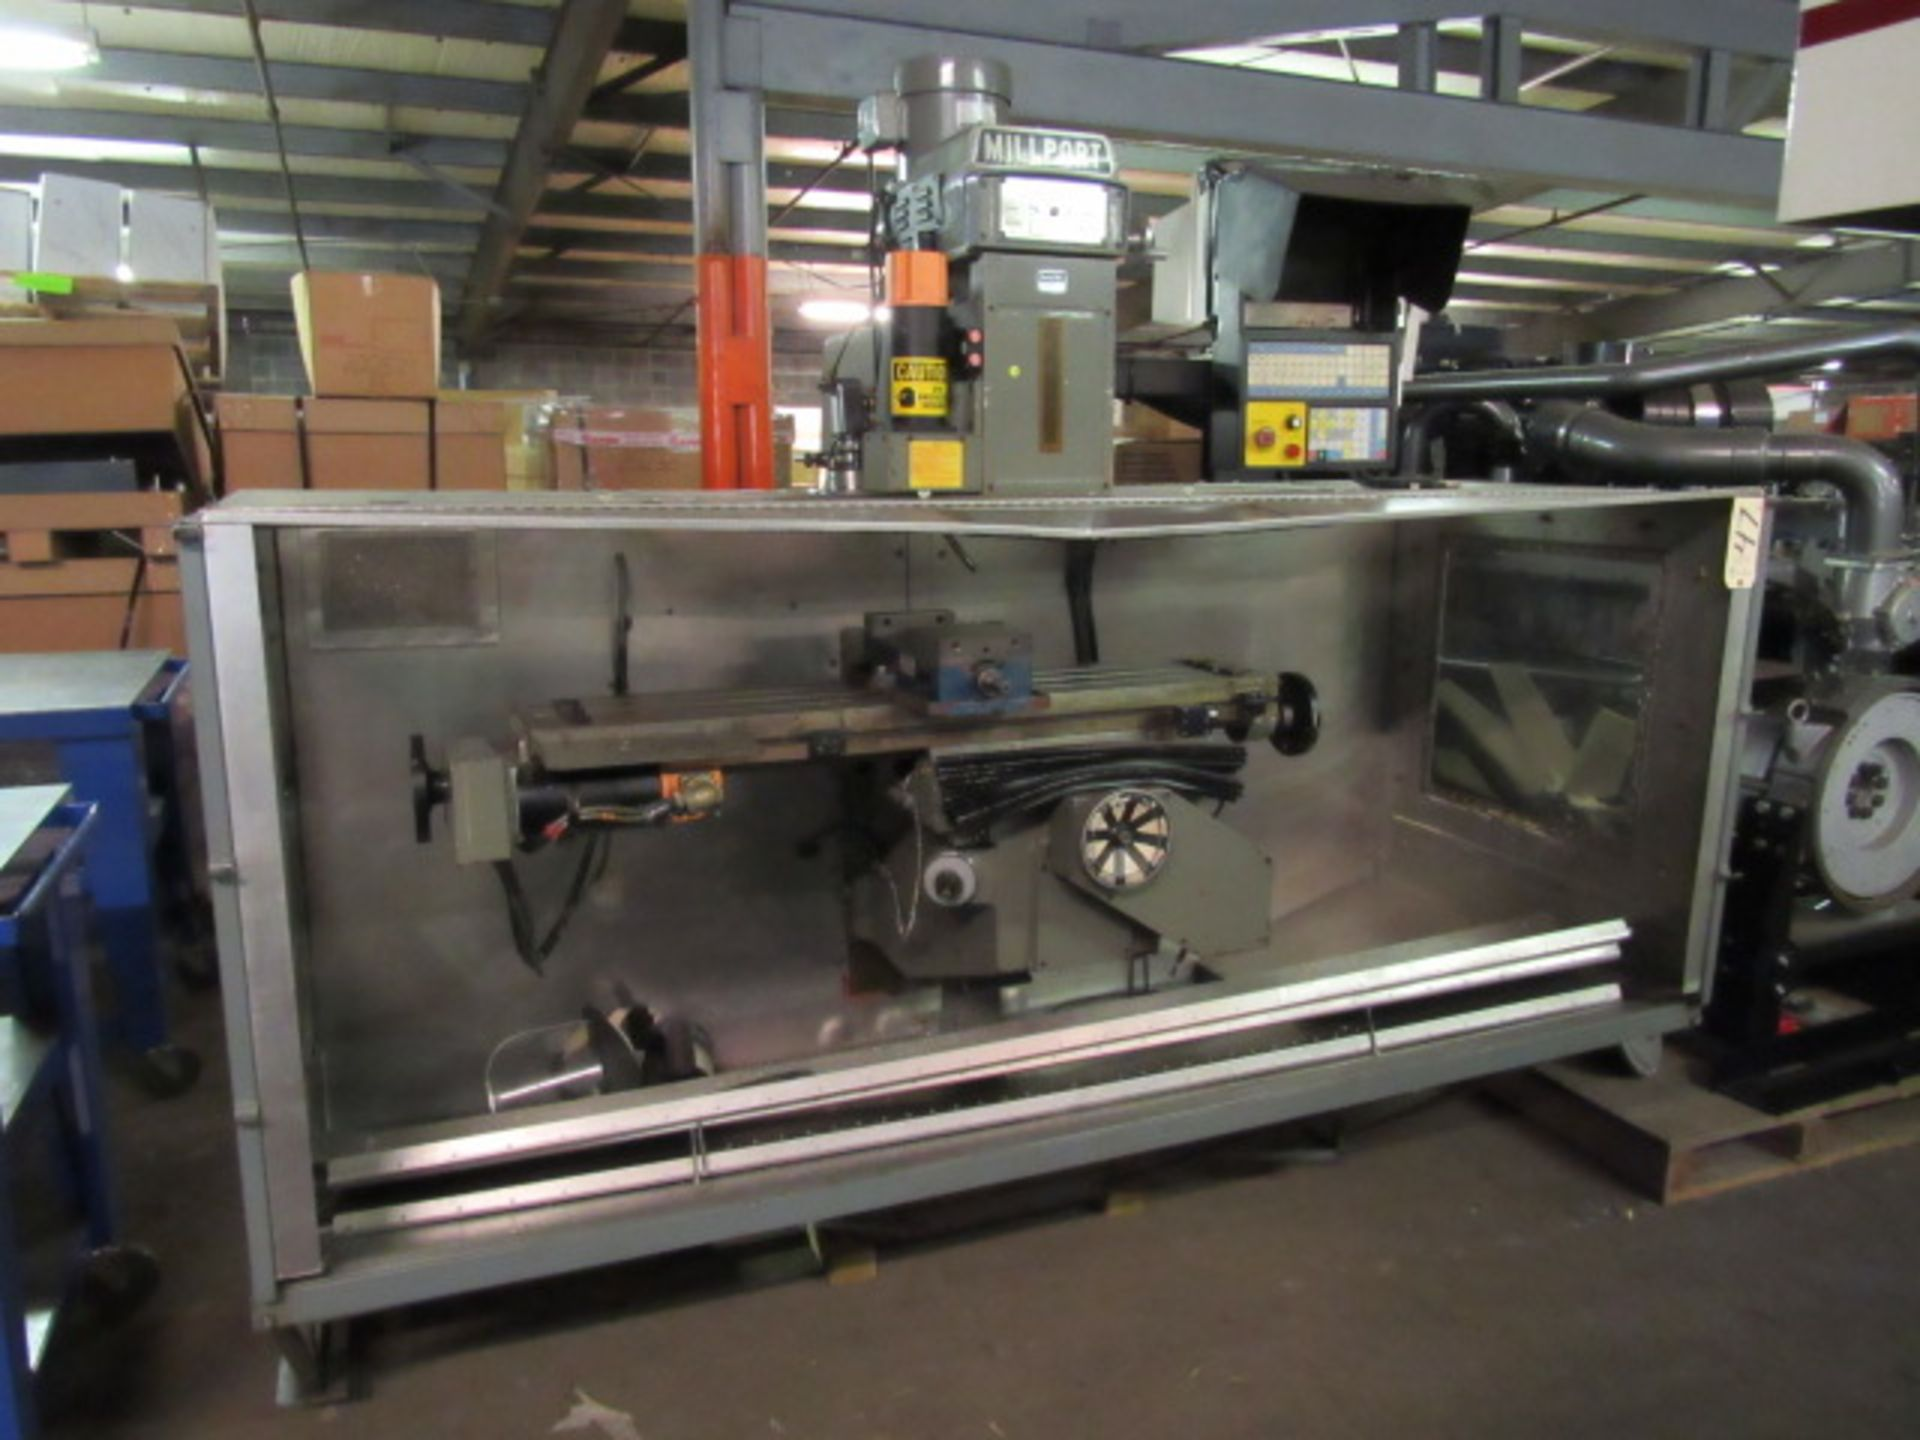 Lot 47 - Millport 3-Axis CNC Milling Machine